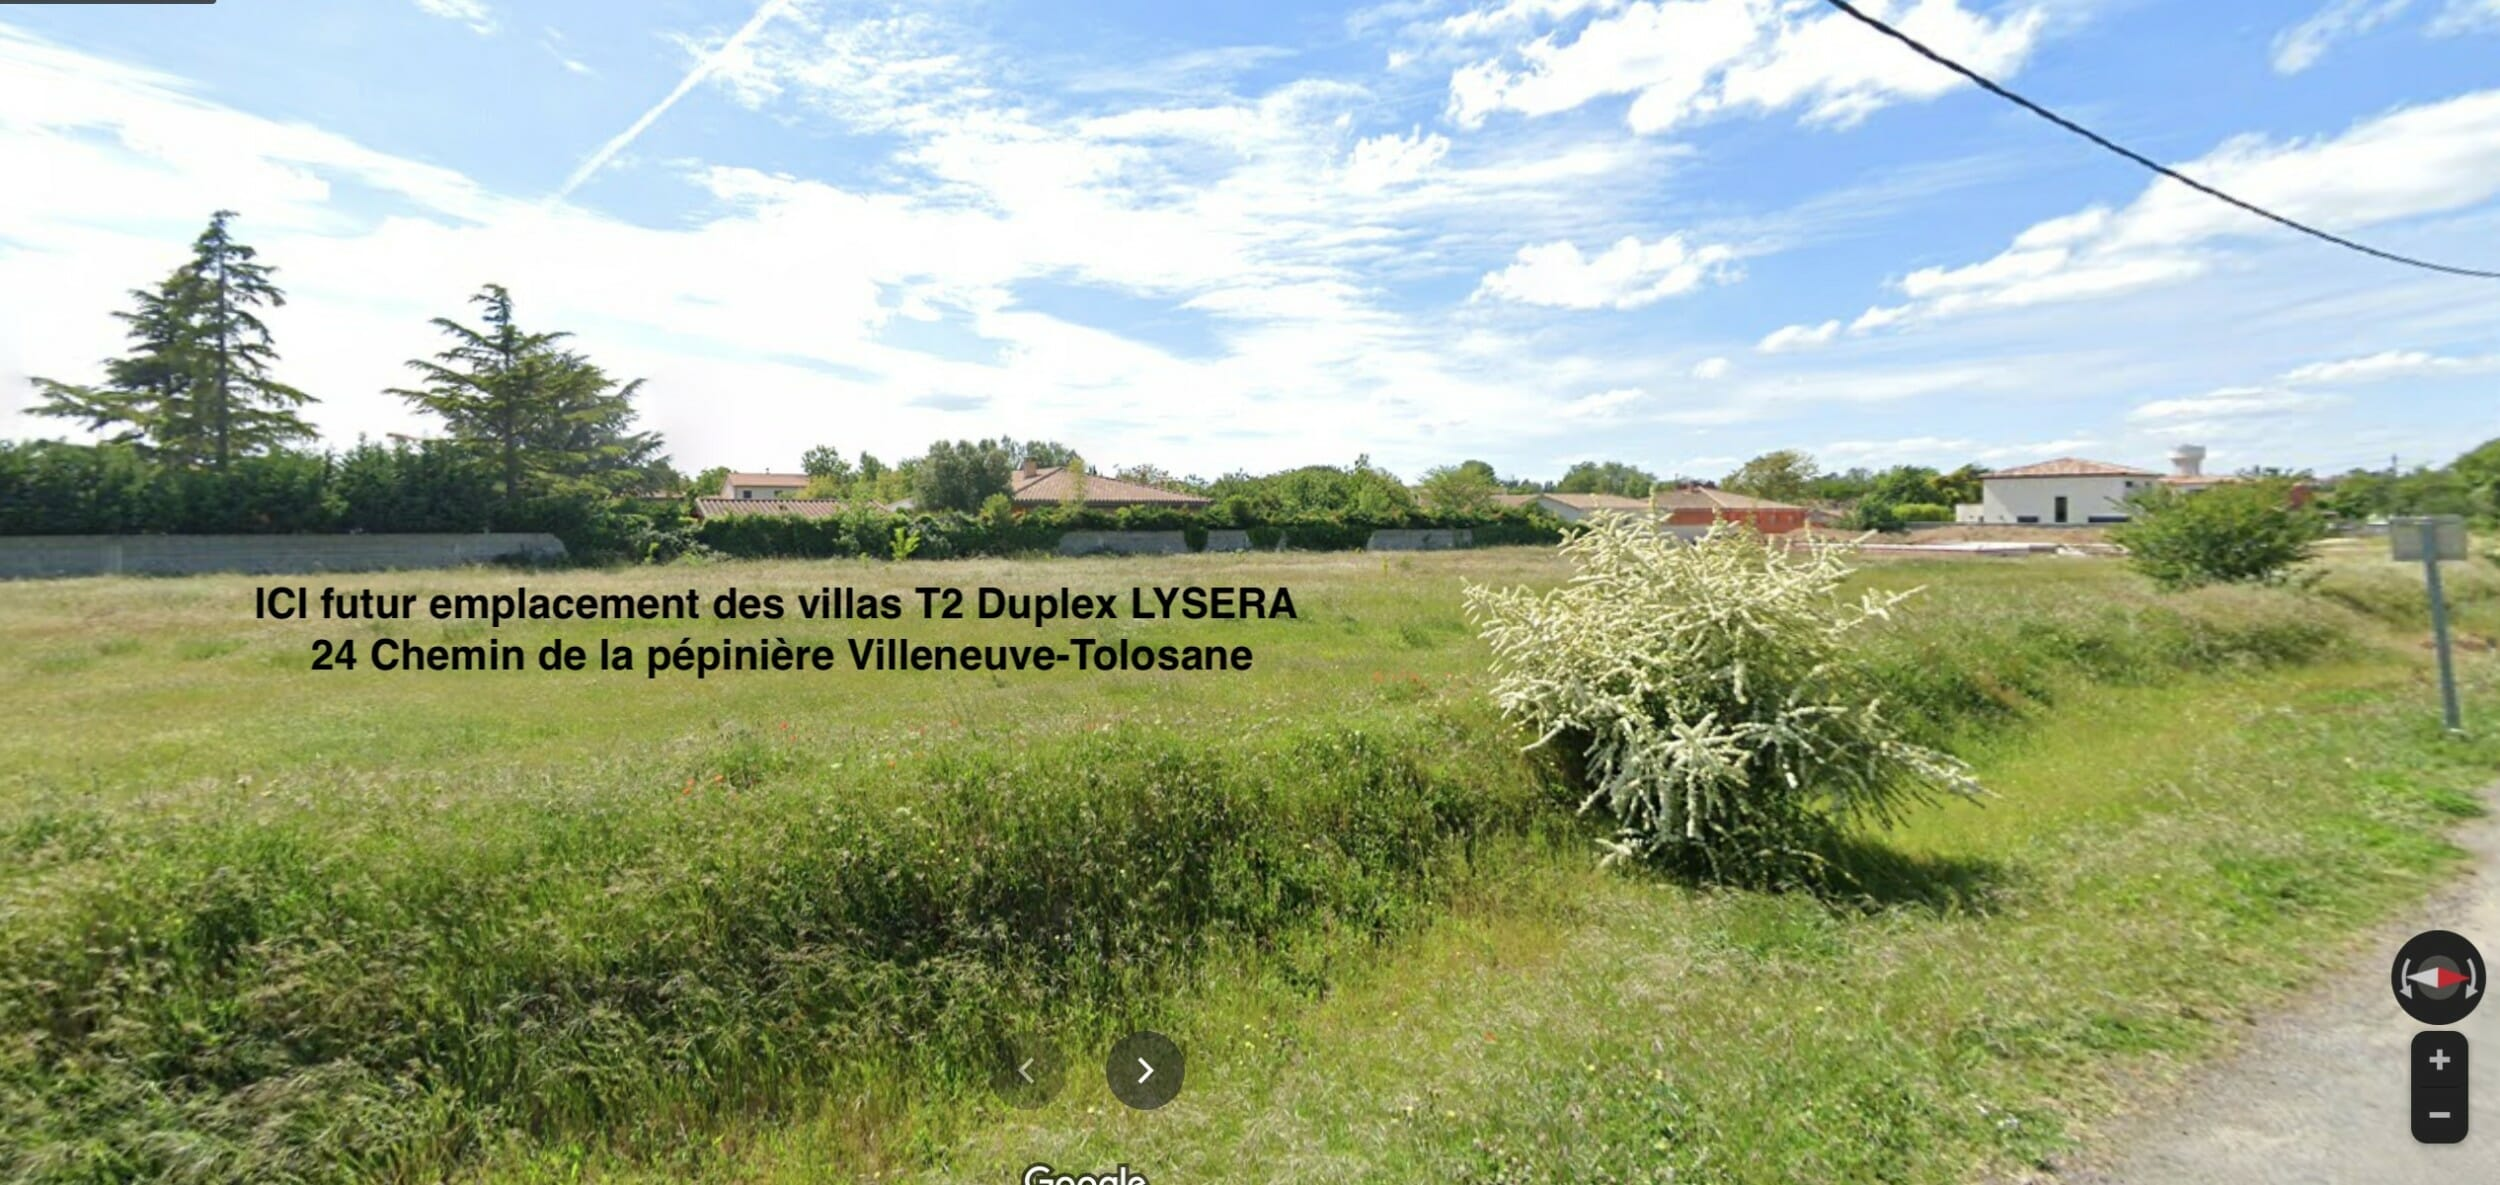 Villas-LYSERA-T2-VilleneuveTolosane-Urbanhouse360